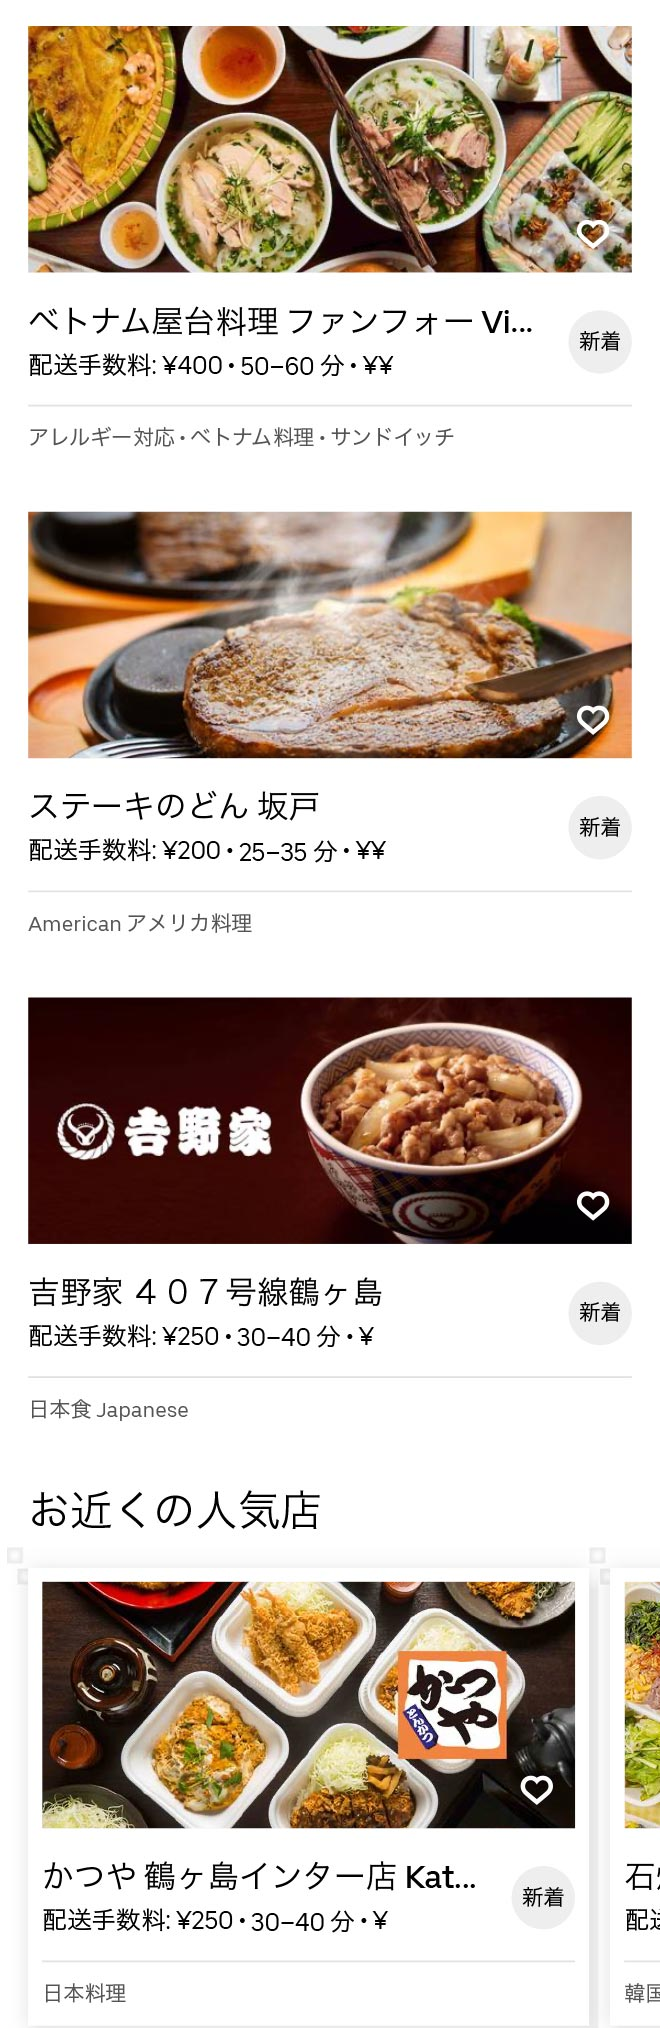 Sakado menu 2010 02